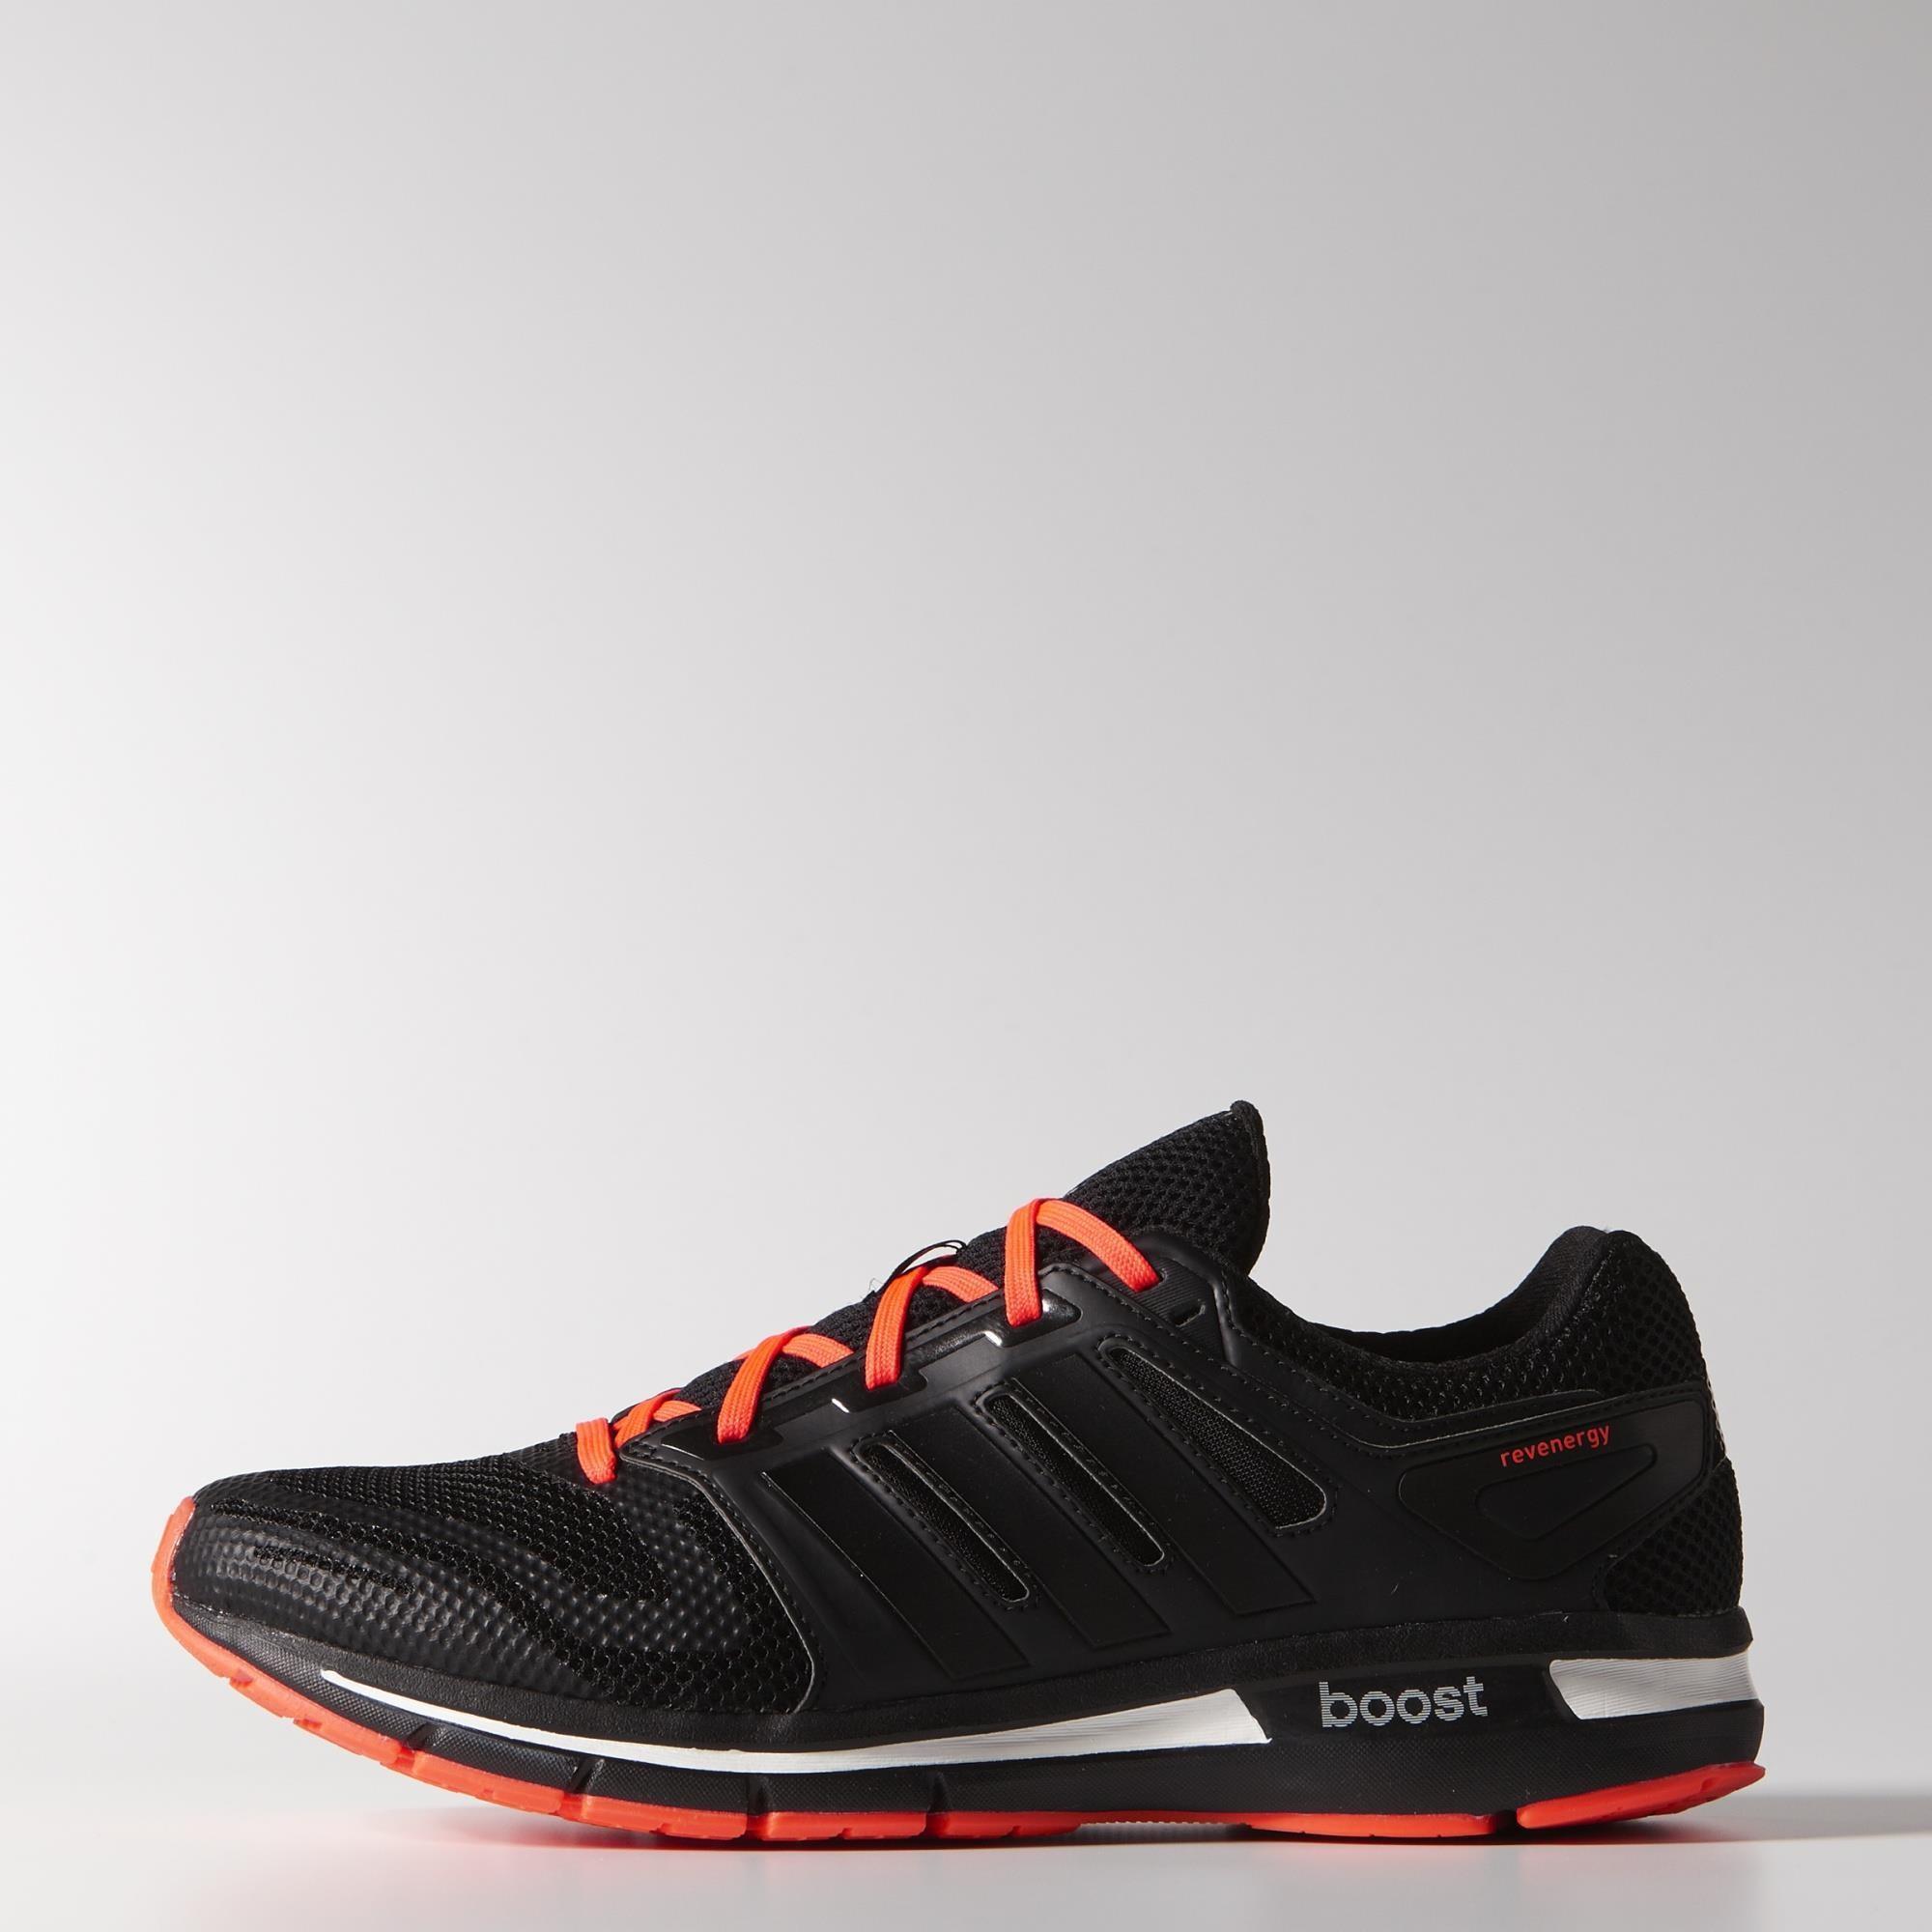 wholesale dealer d6c40 20206 Adidas Mens Revenergy Mesh Running Shoes - BlackSolar Red - Tennisnuts.com